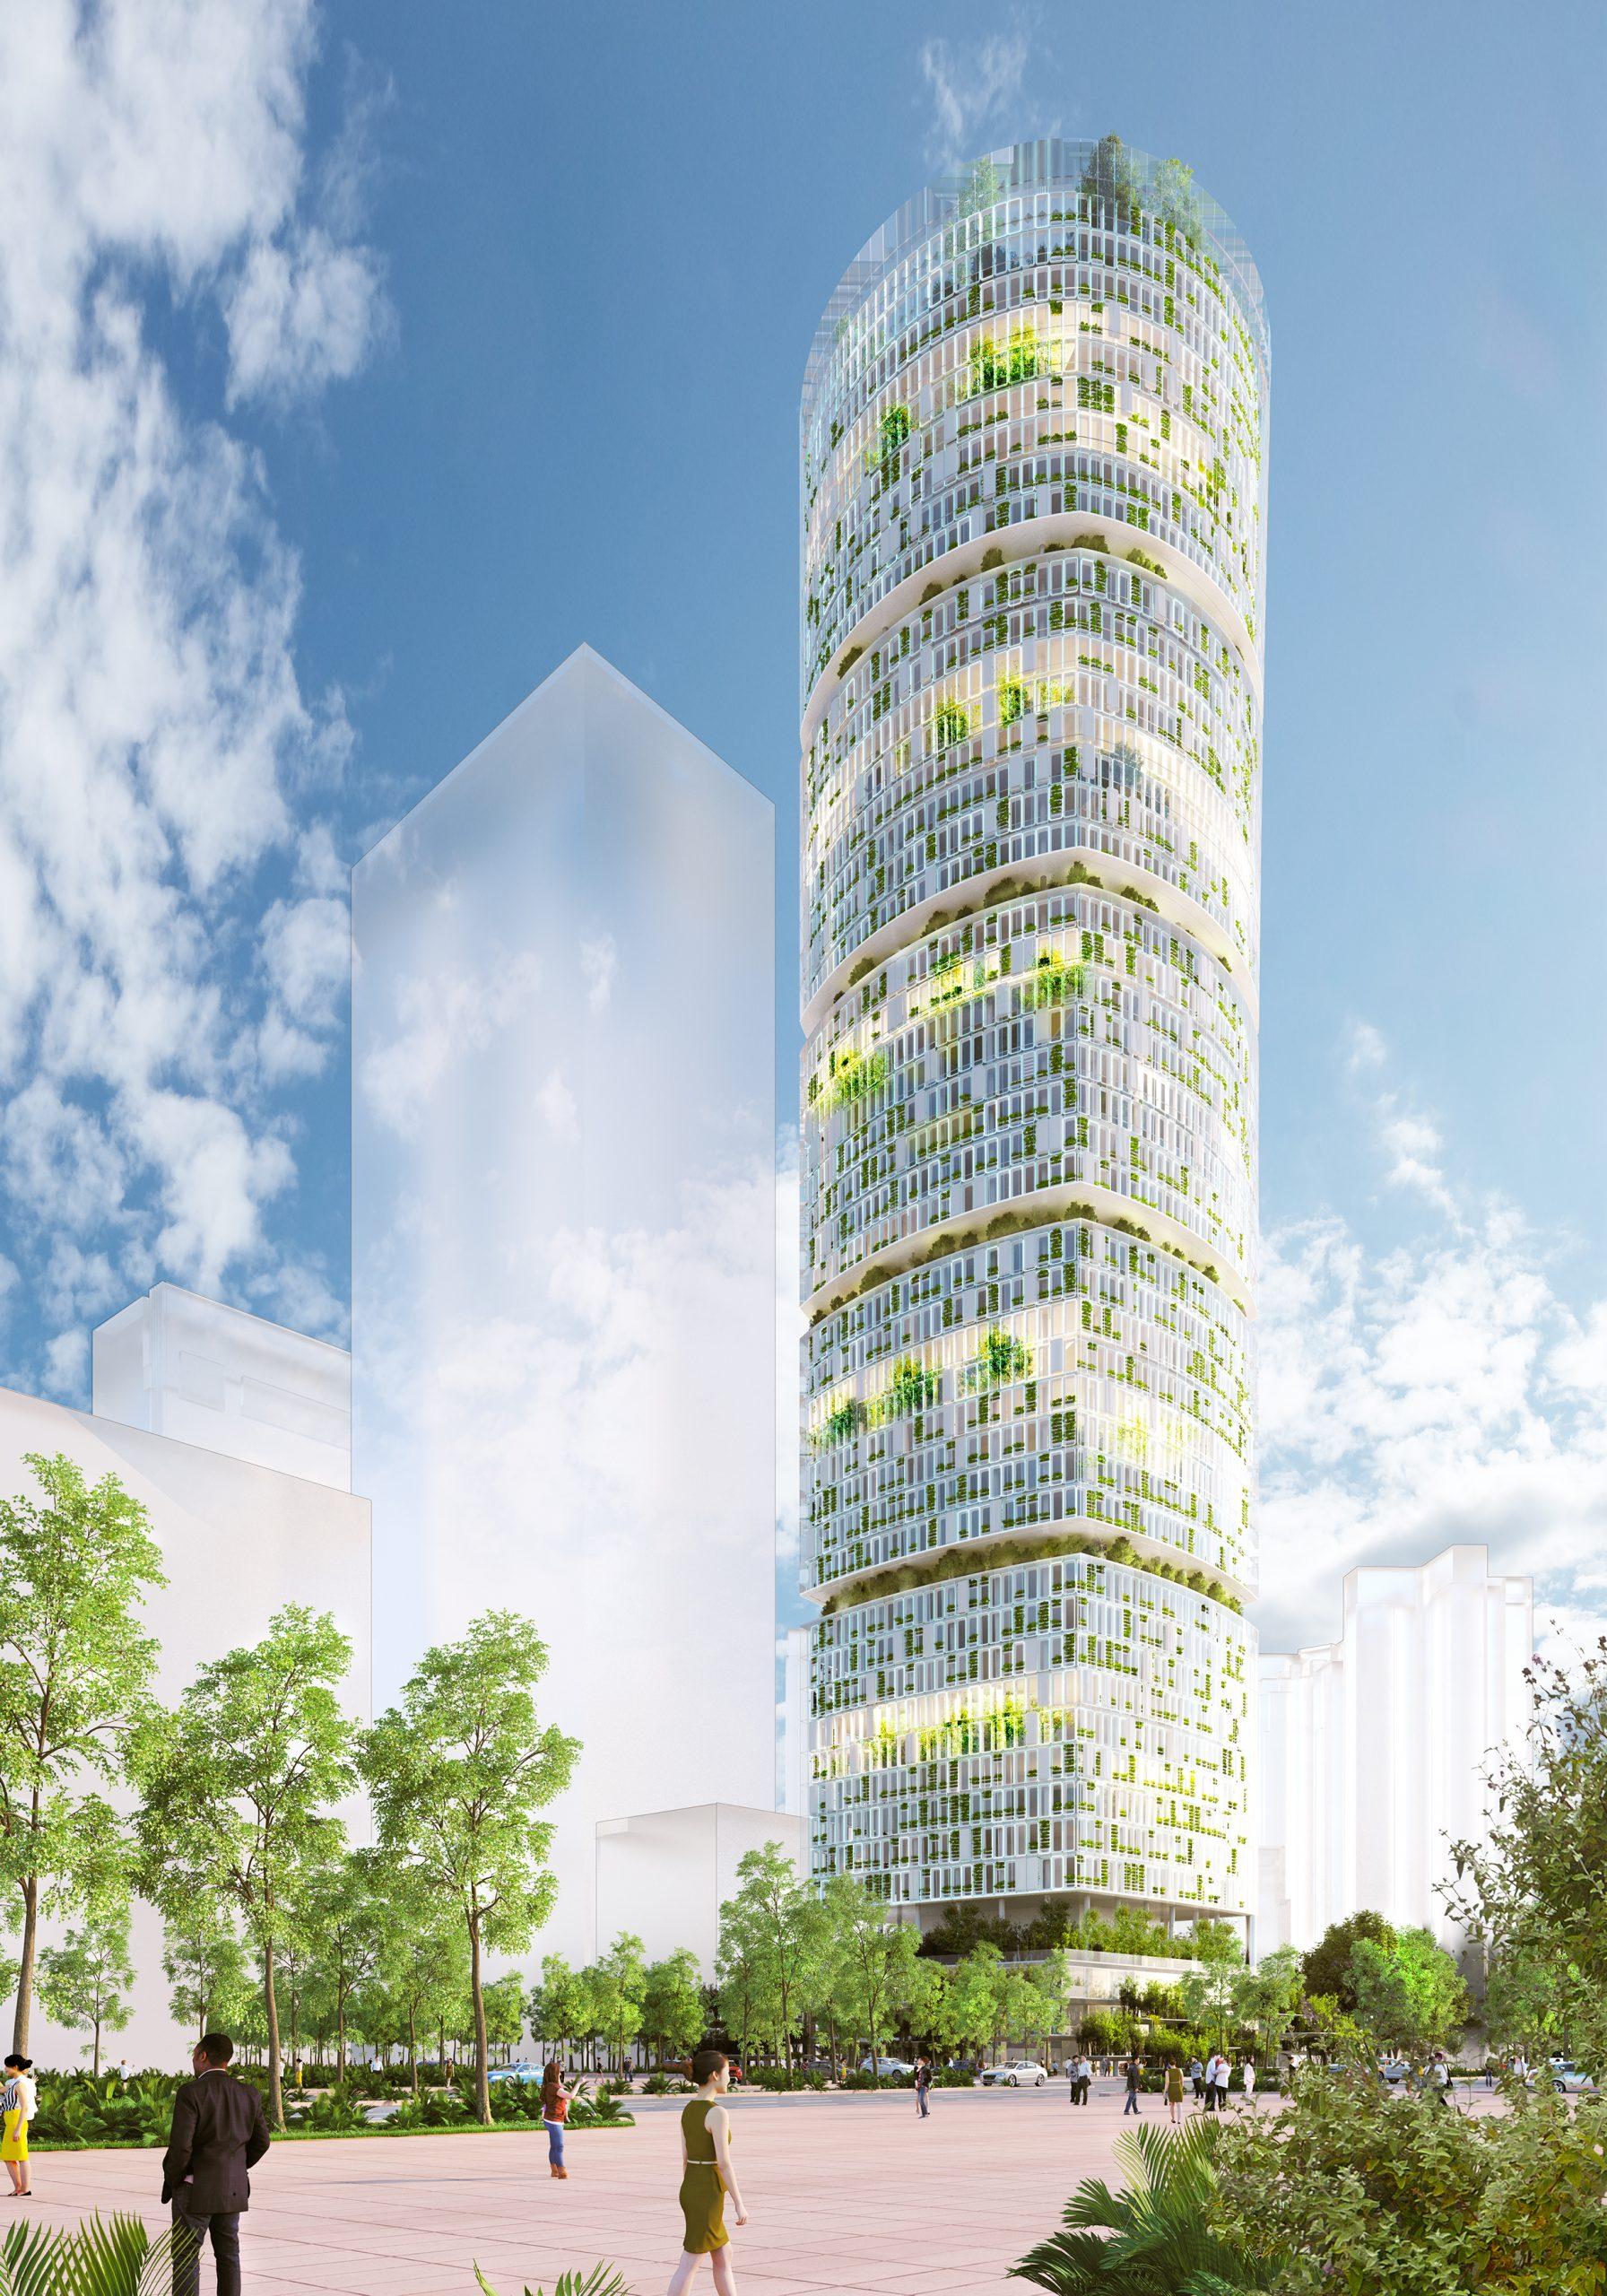 Il grattacielo fattoria idroponica Jian Mu Tower (CREDITS CRA-Carlo Ratti Associati)